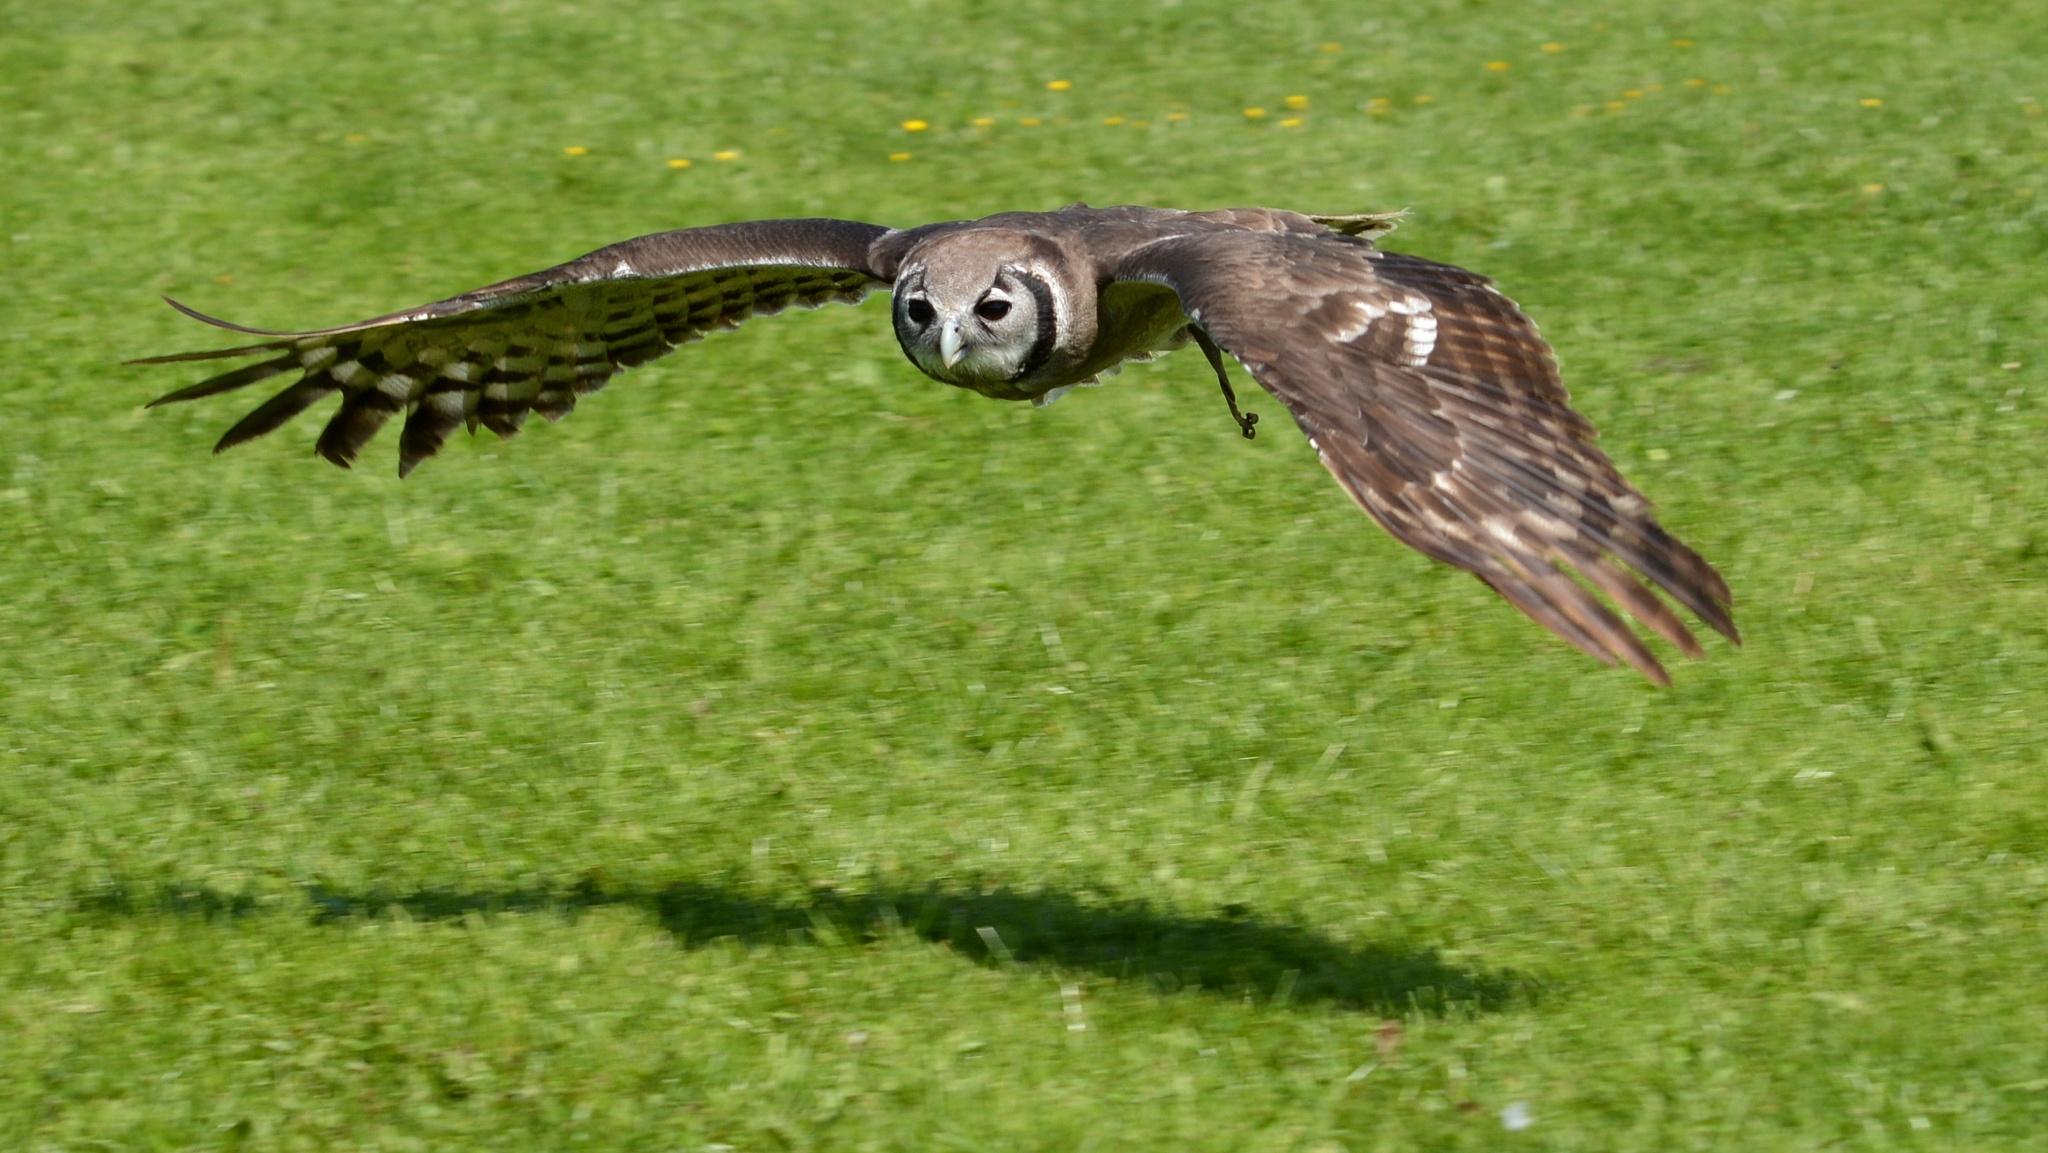 owl by martin vuurpijl